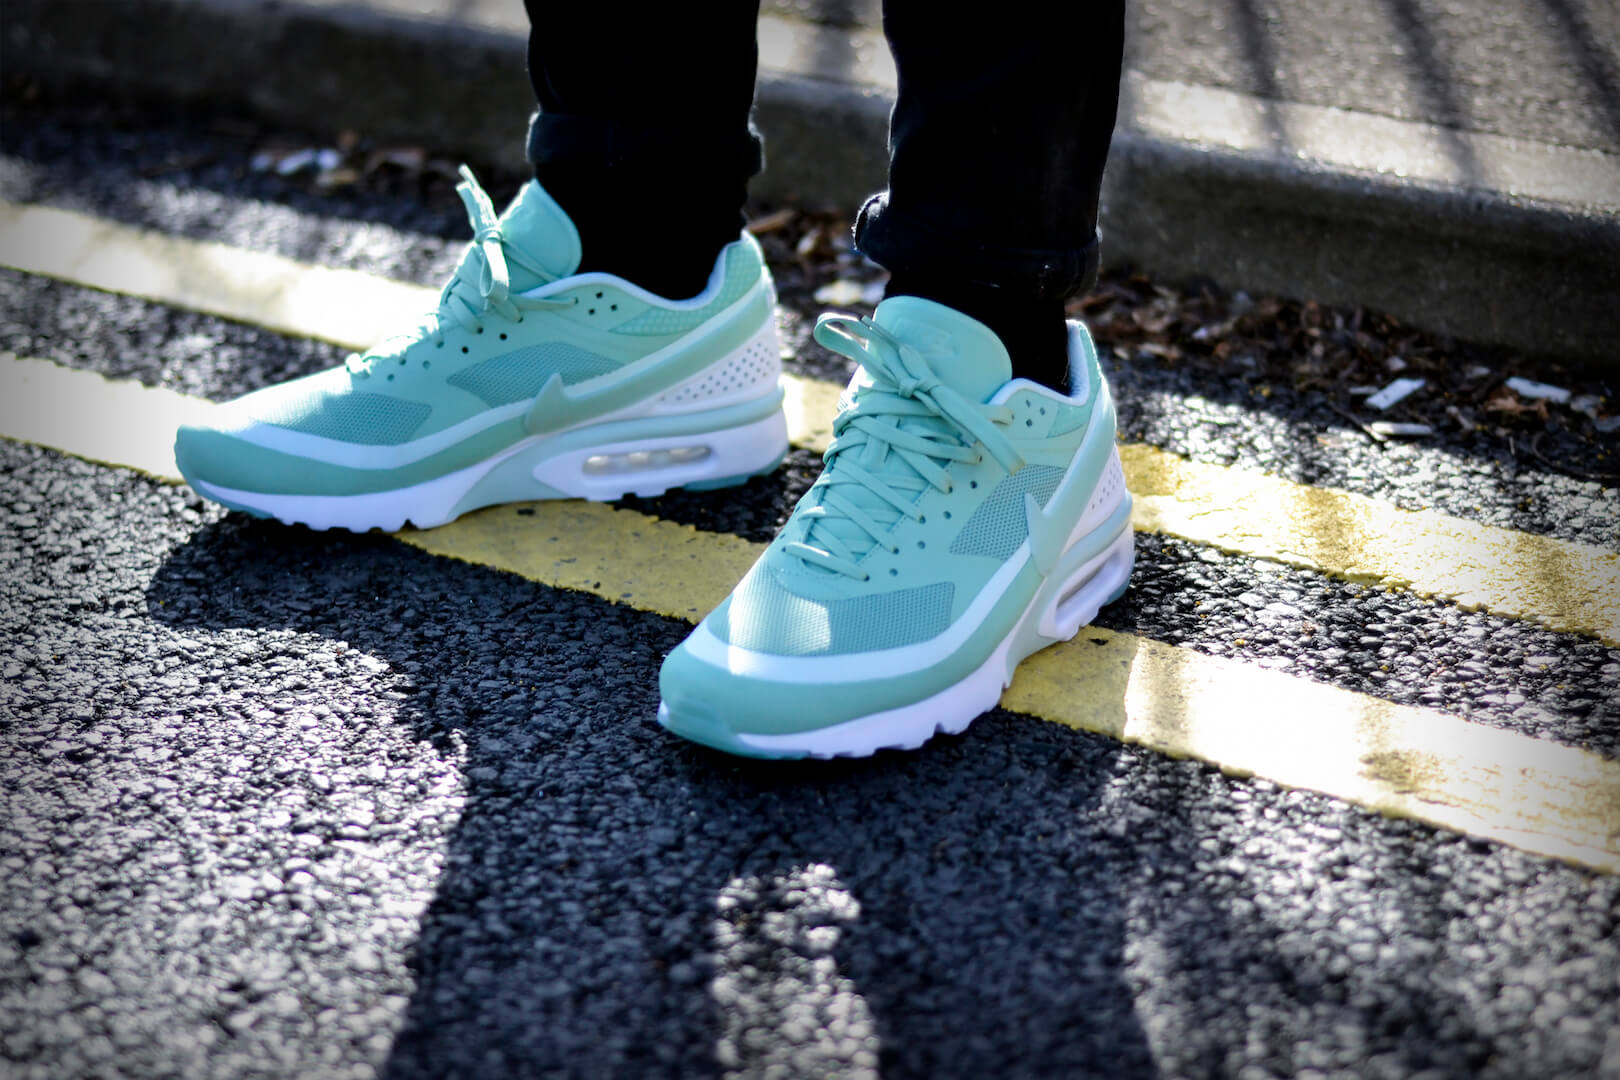 Nike Air Max Bw Ultra Mint